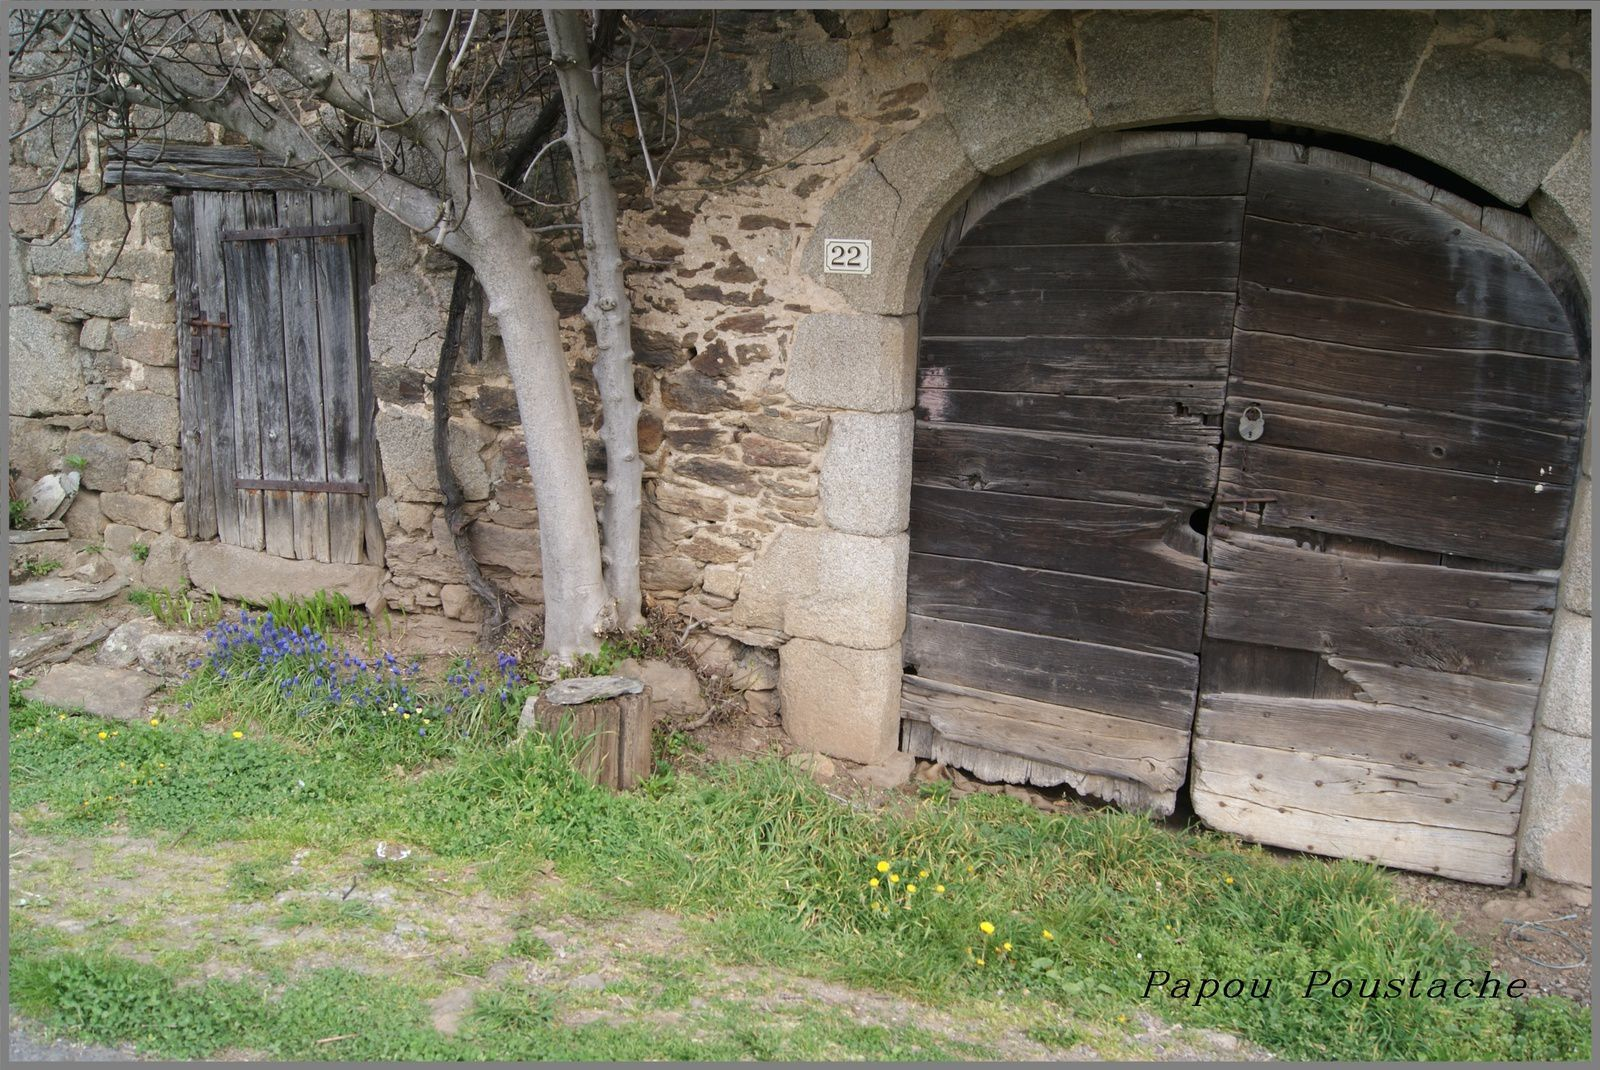 Auhasard dans Cassaniouze